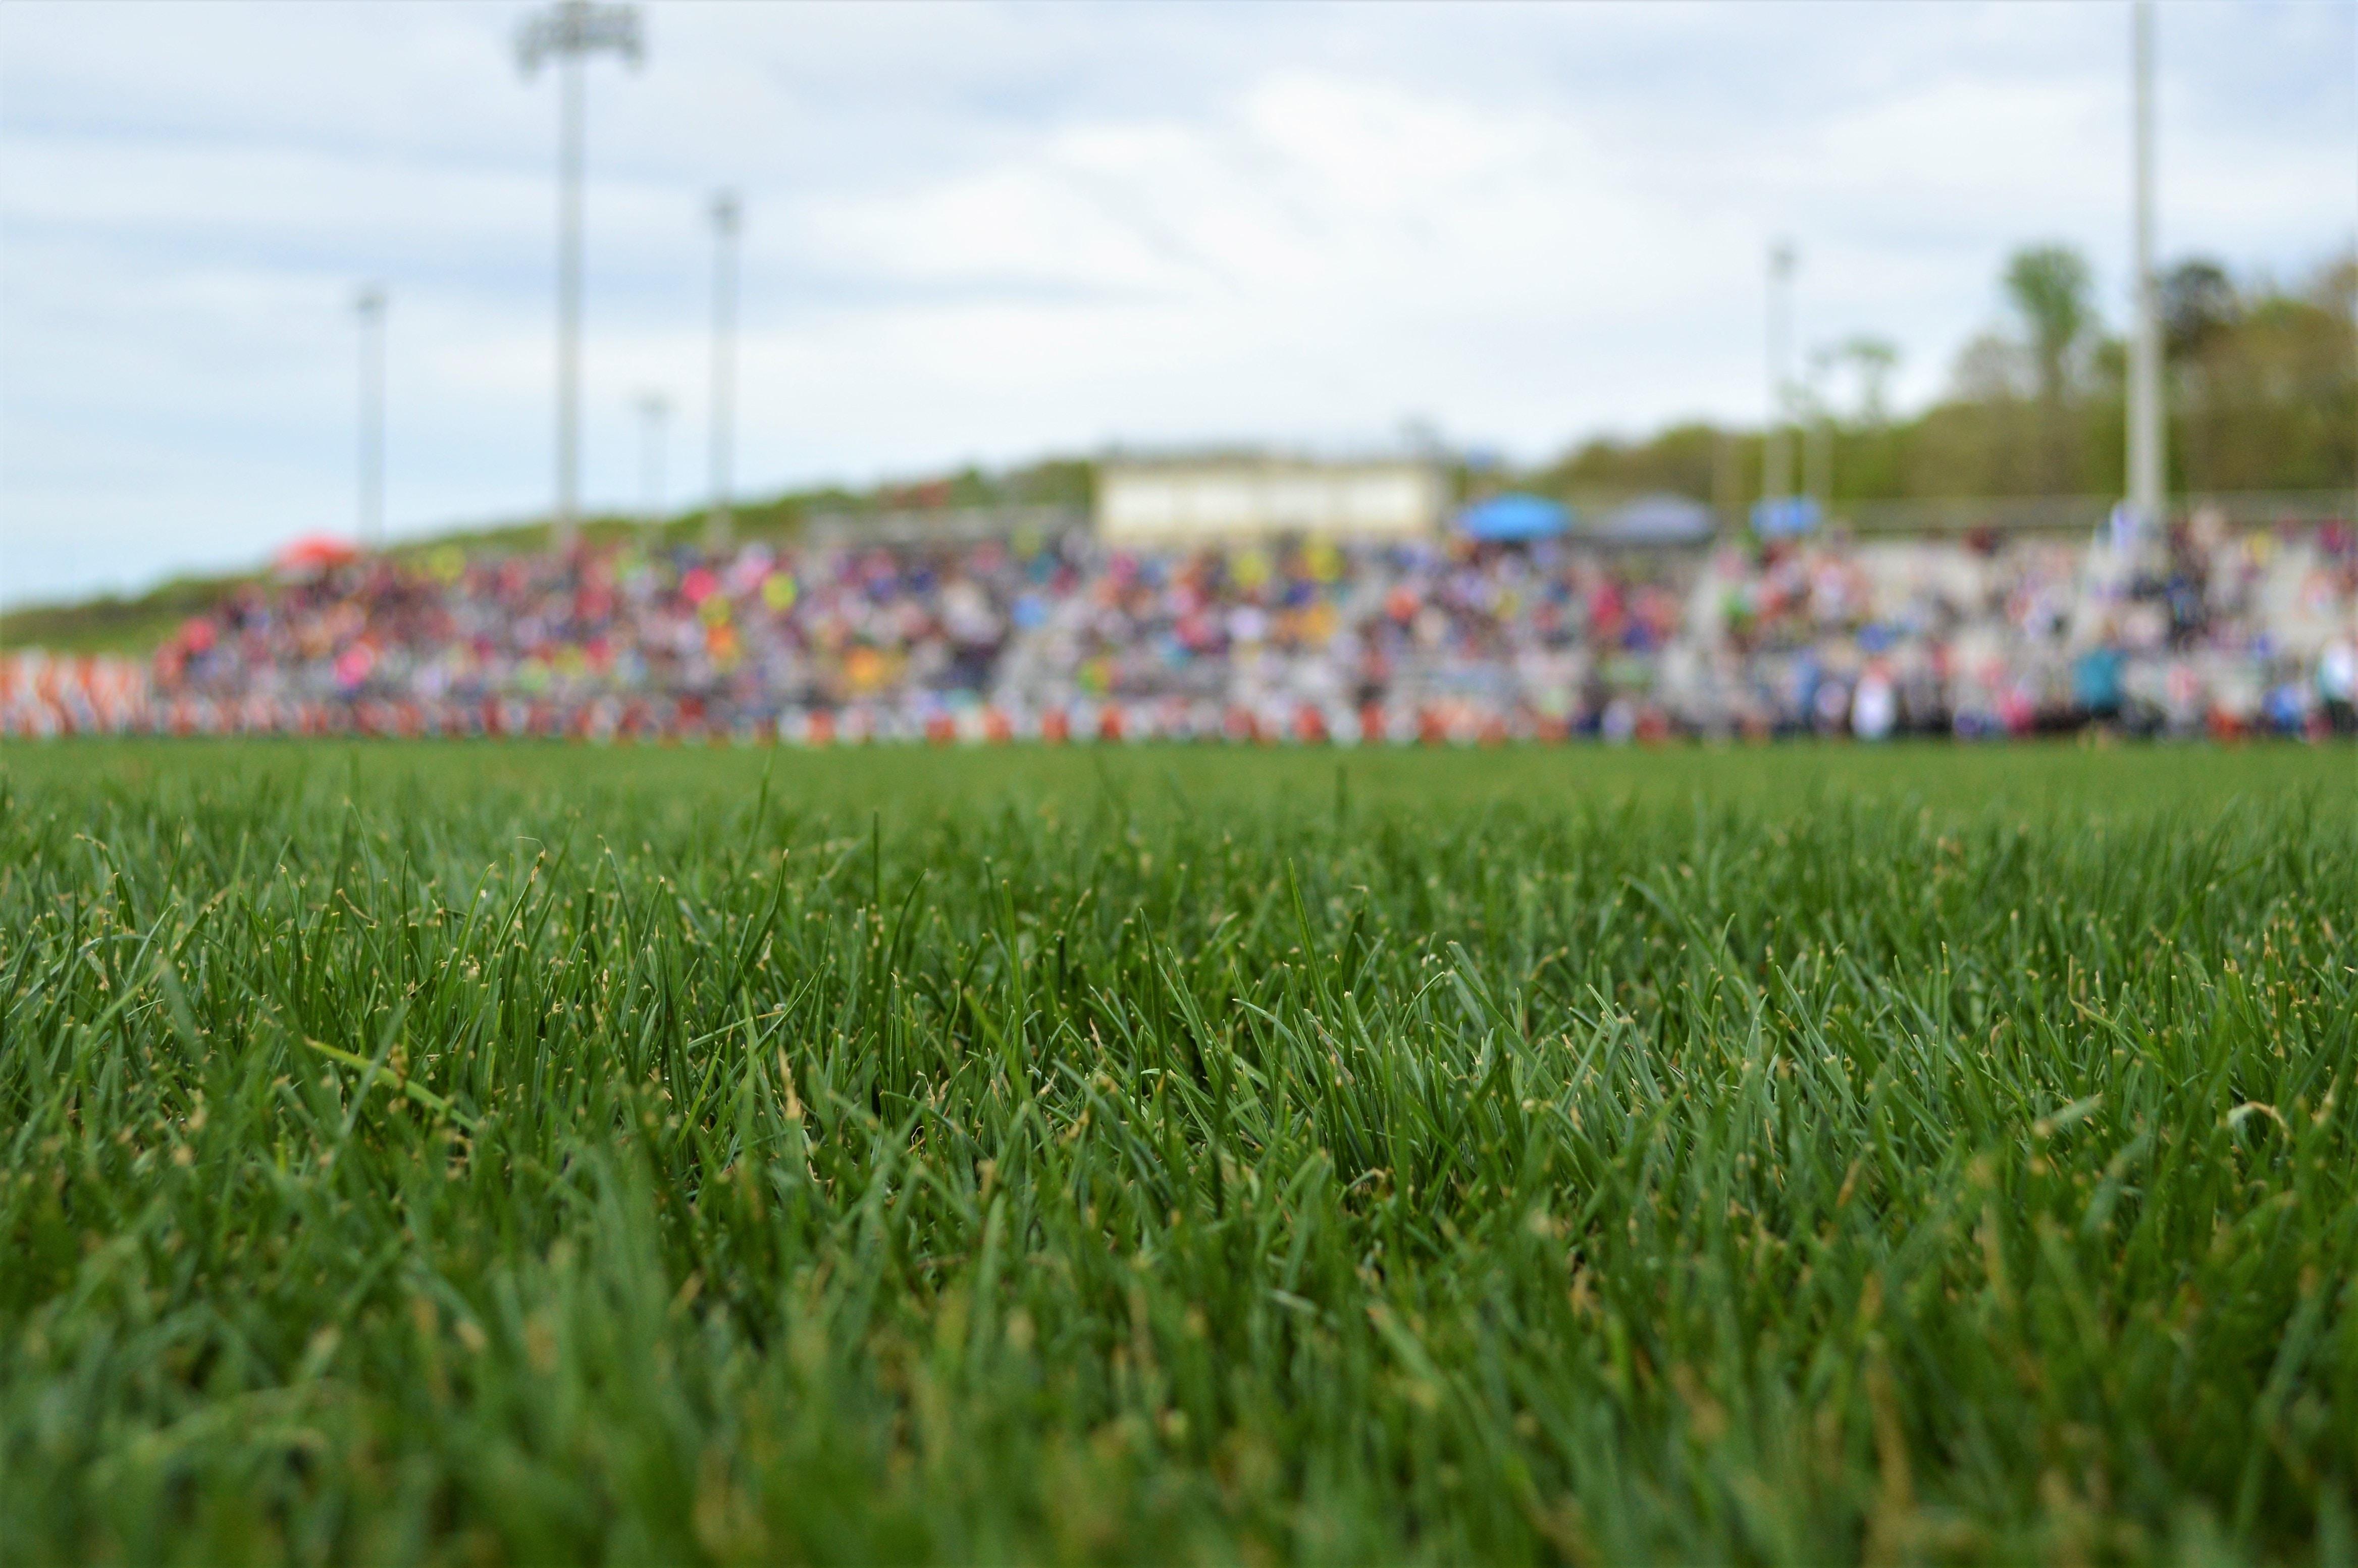 close-up photo of green grass field